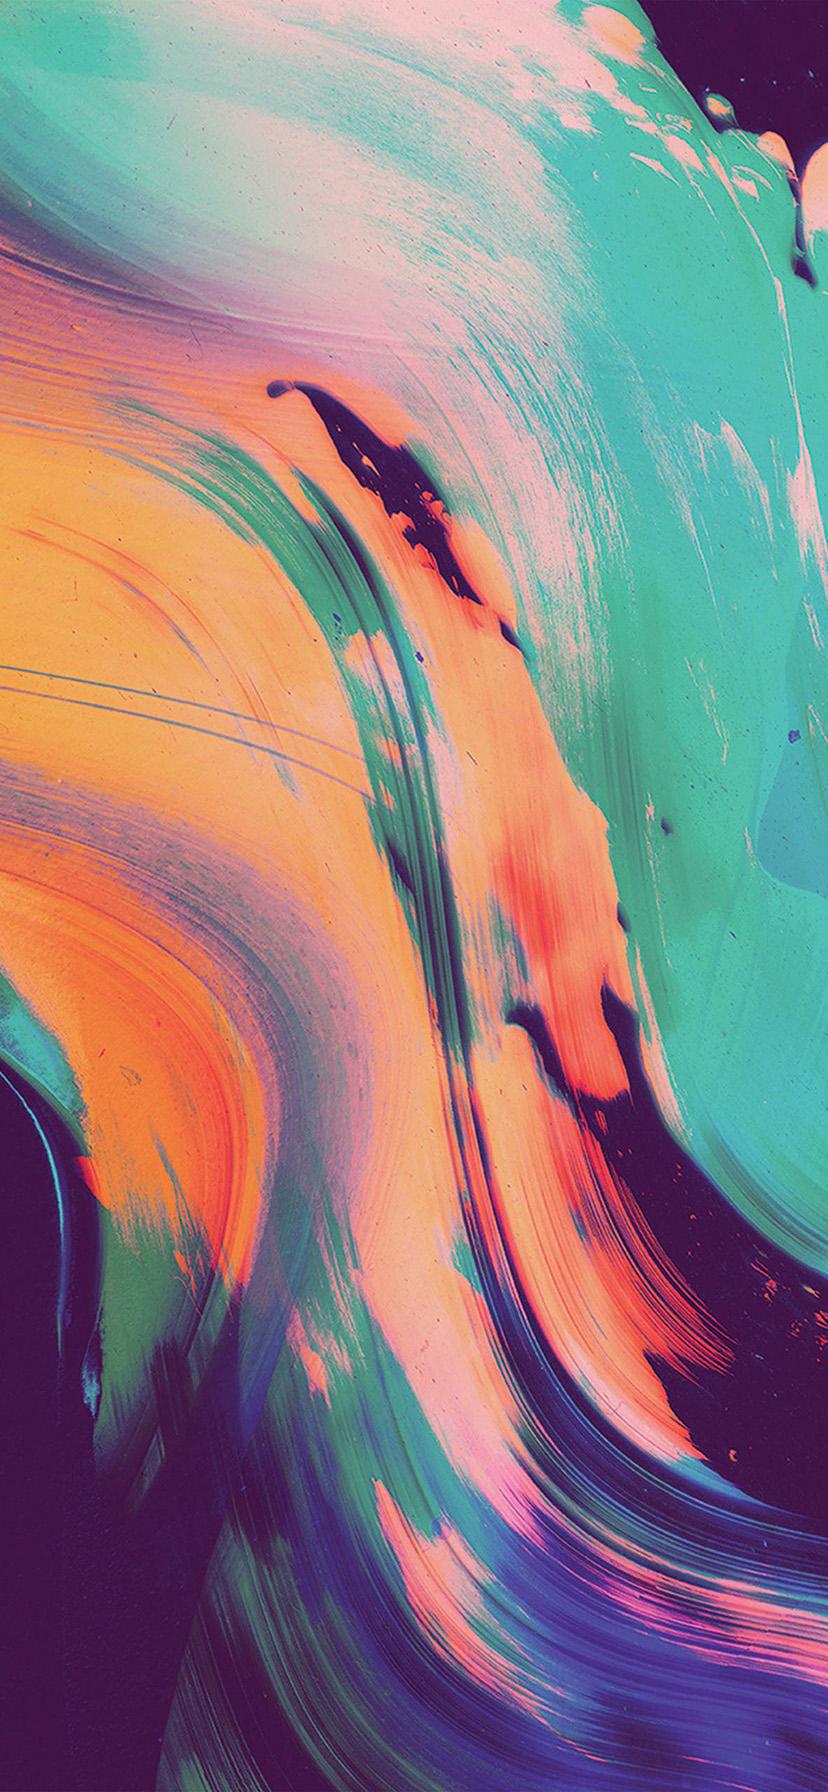 Cool Wallpaper Iphone Xr